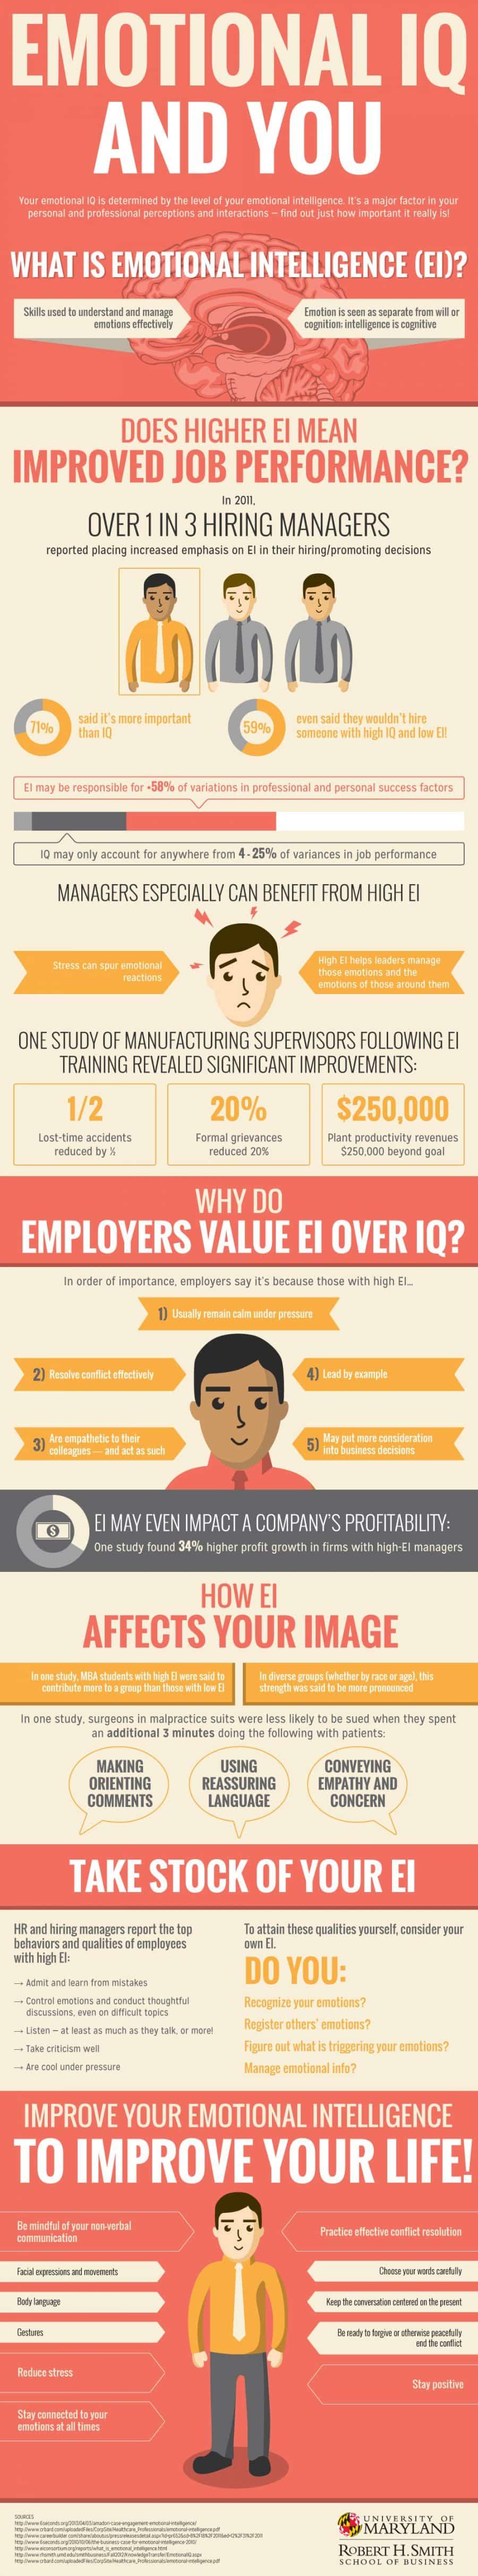 EmotionalIQ-Infographic